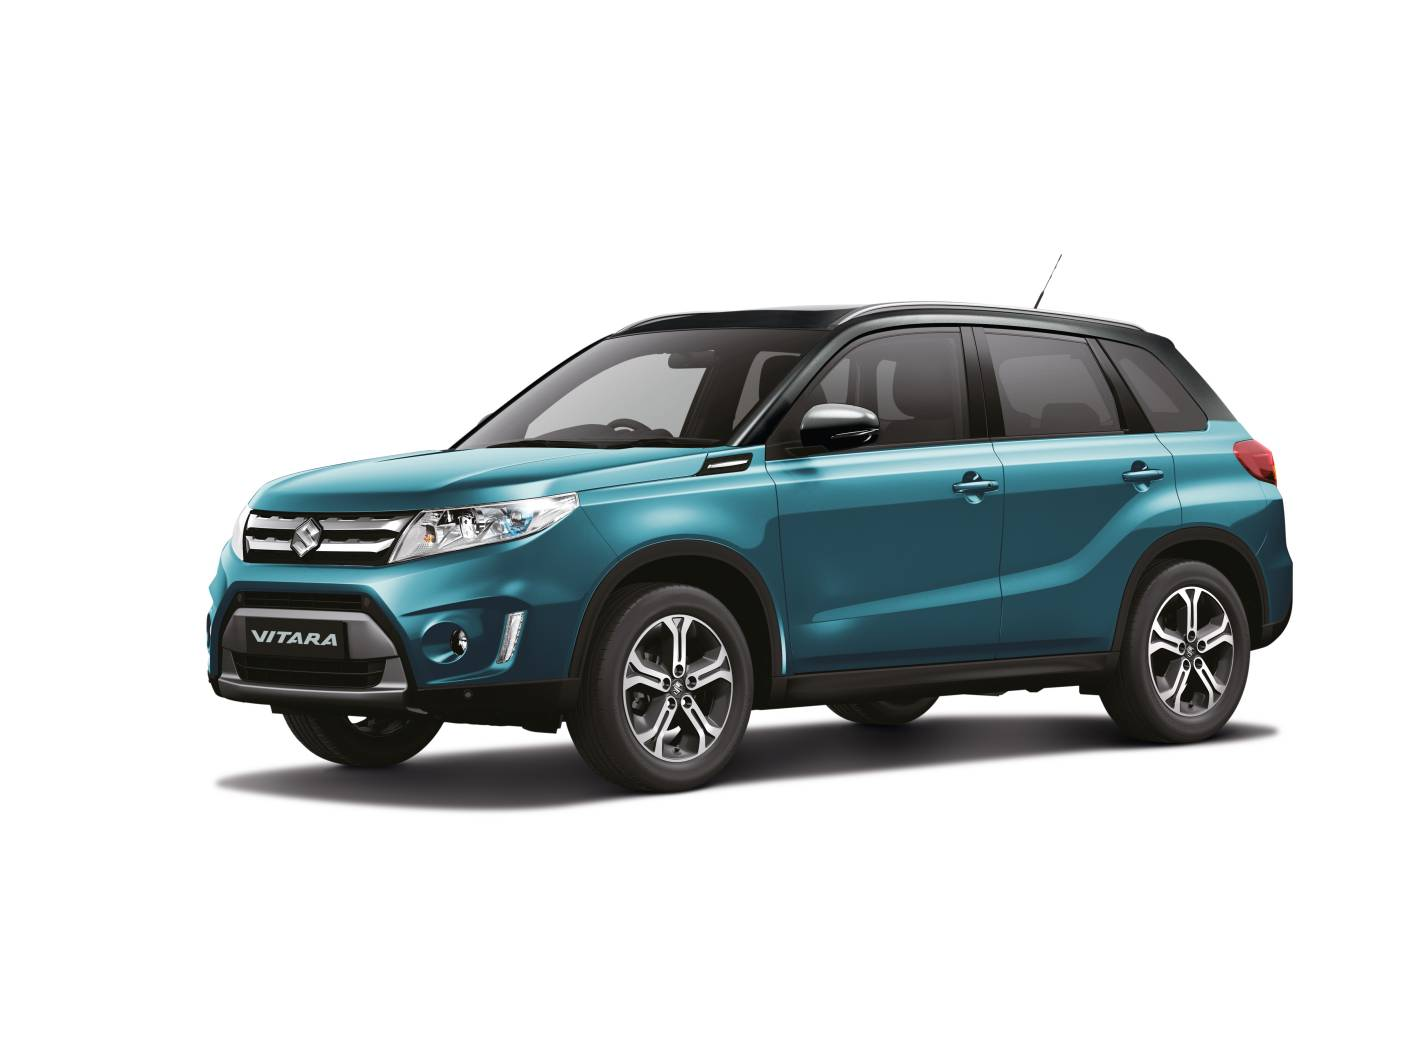 suzuki cars news new diesel rt x model to vitara line up. Black Bedroom Furniture Sets. Home Design Ideas